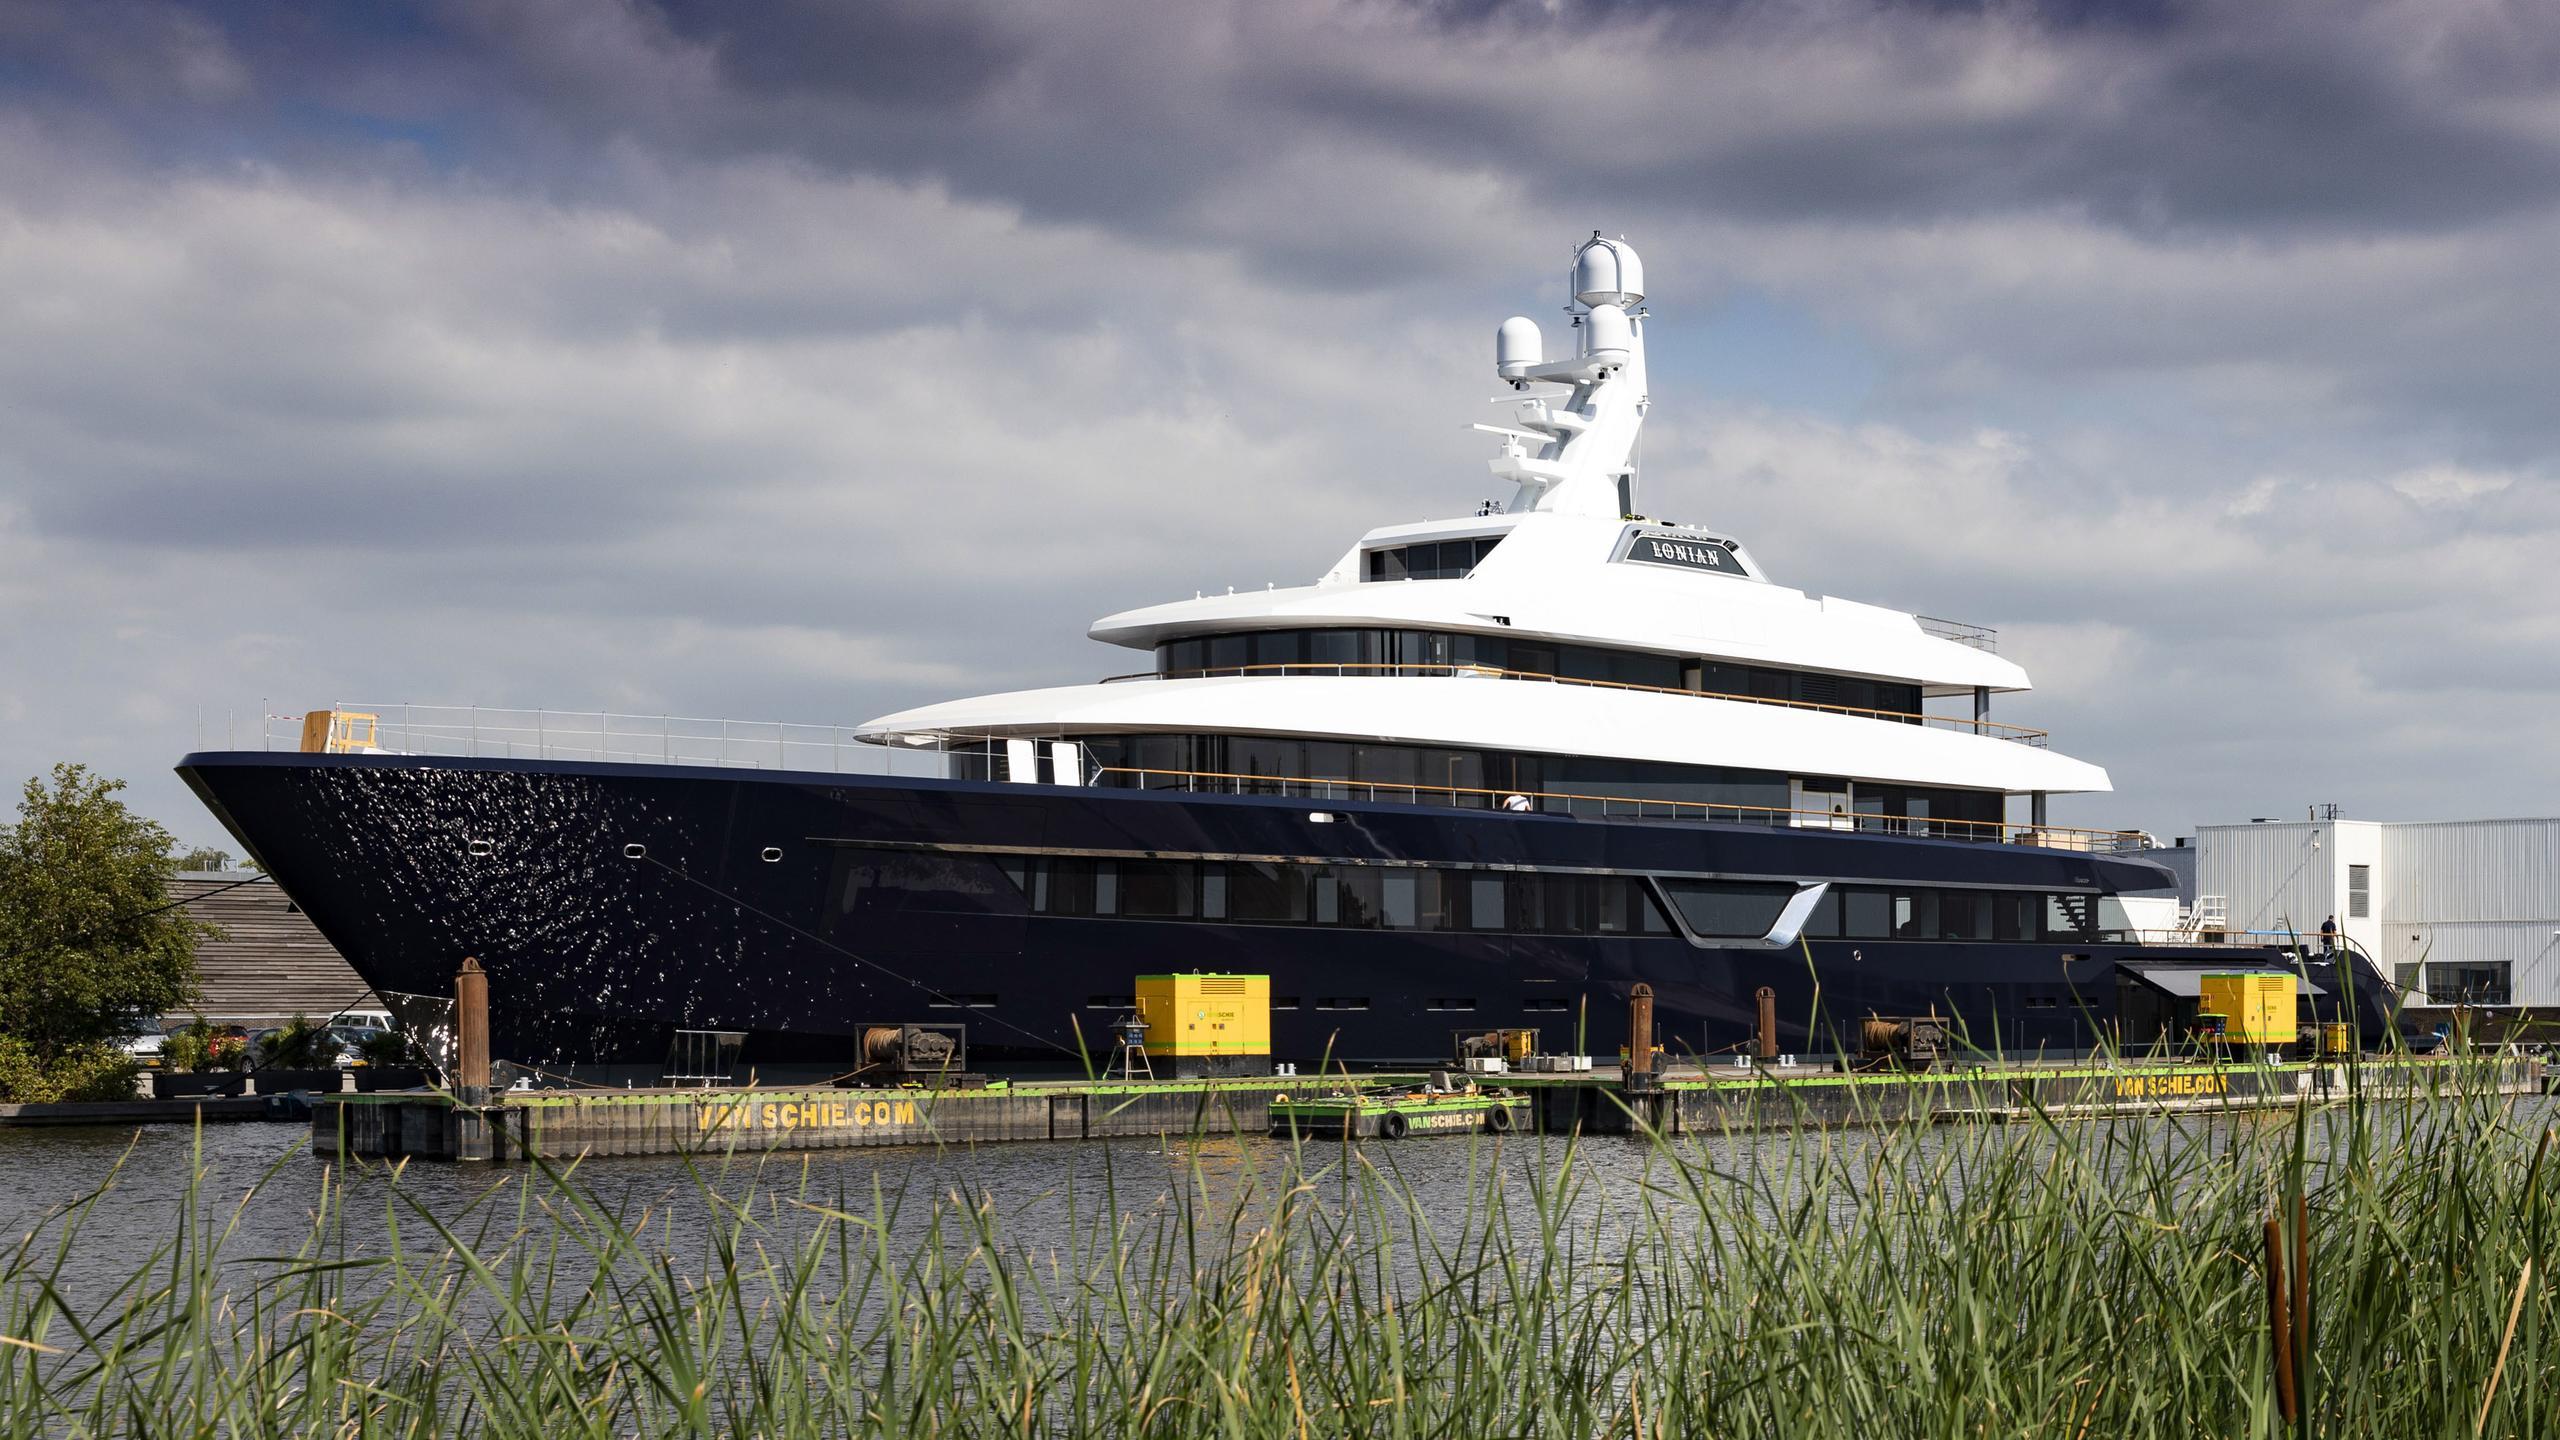 lonian motoryacht feadship 87m 2018 launch half profile